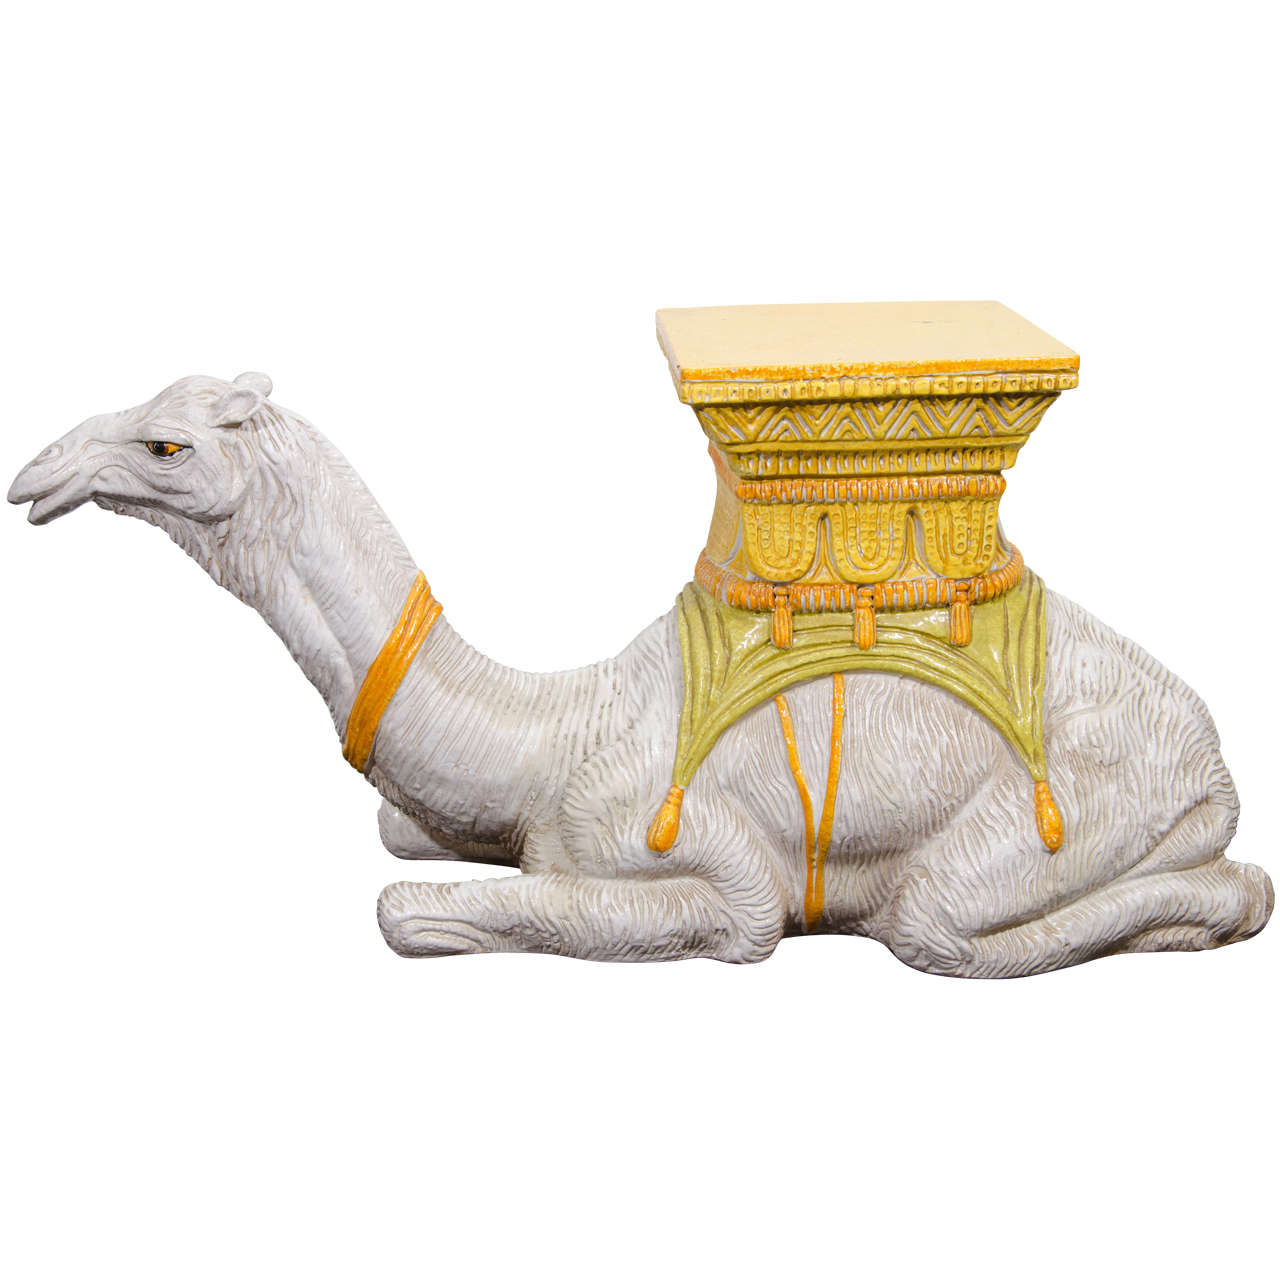 Midcentury Highly Decorative Italian Ceramic Camel Form Garden Seat For Sale